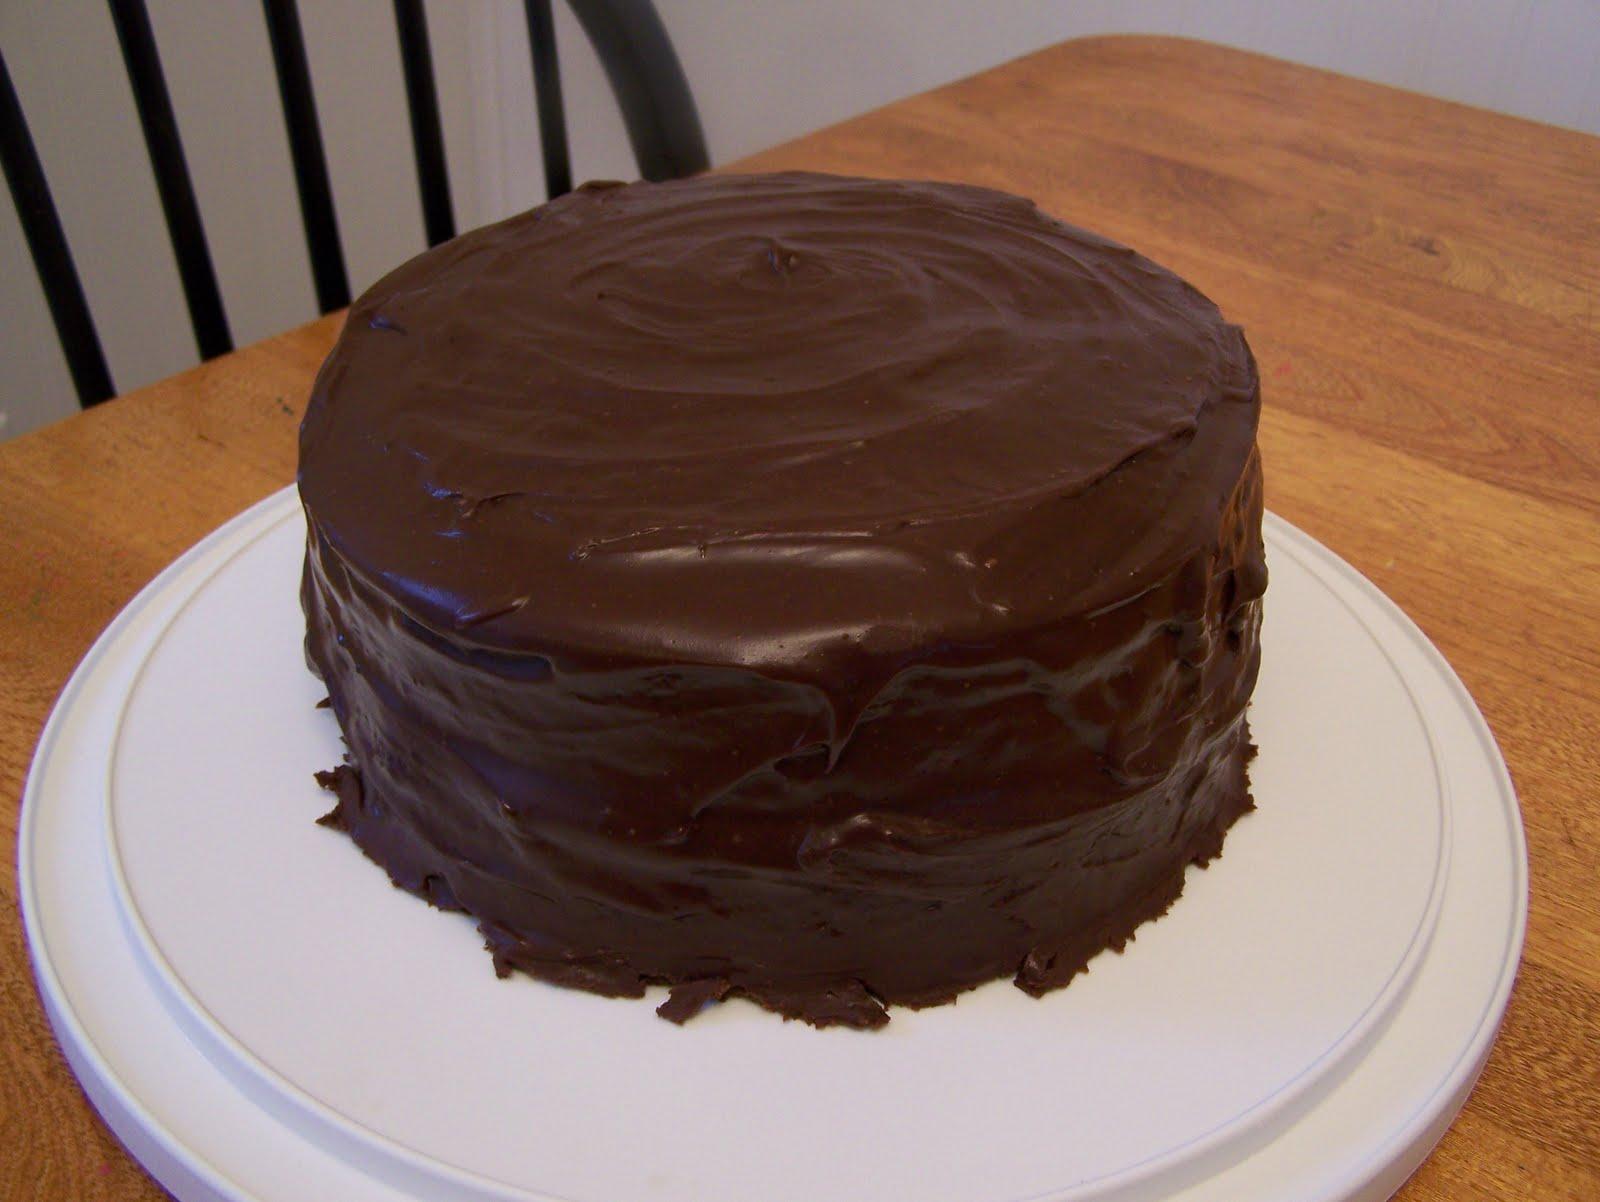 ... fudge fastest fudge cake mastercook cake fudge sundae cake fastest